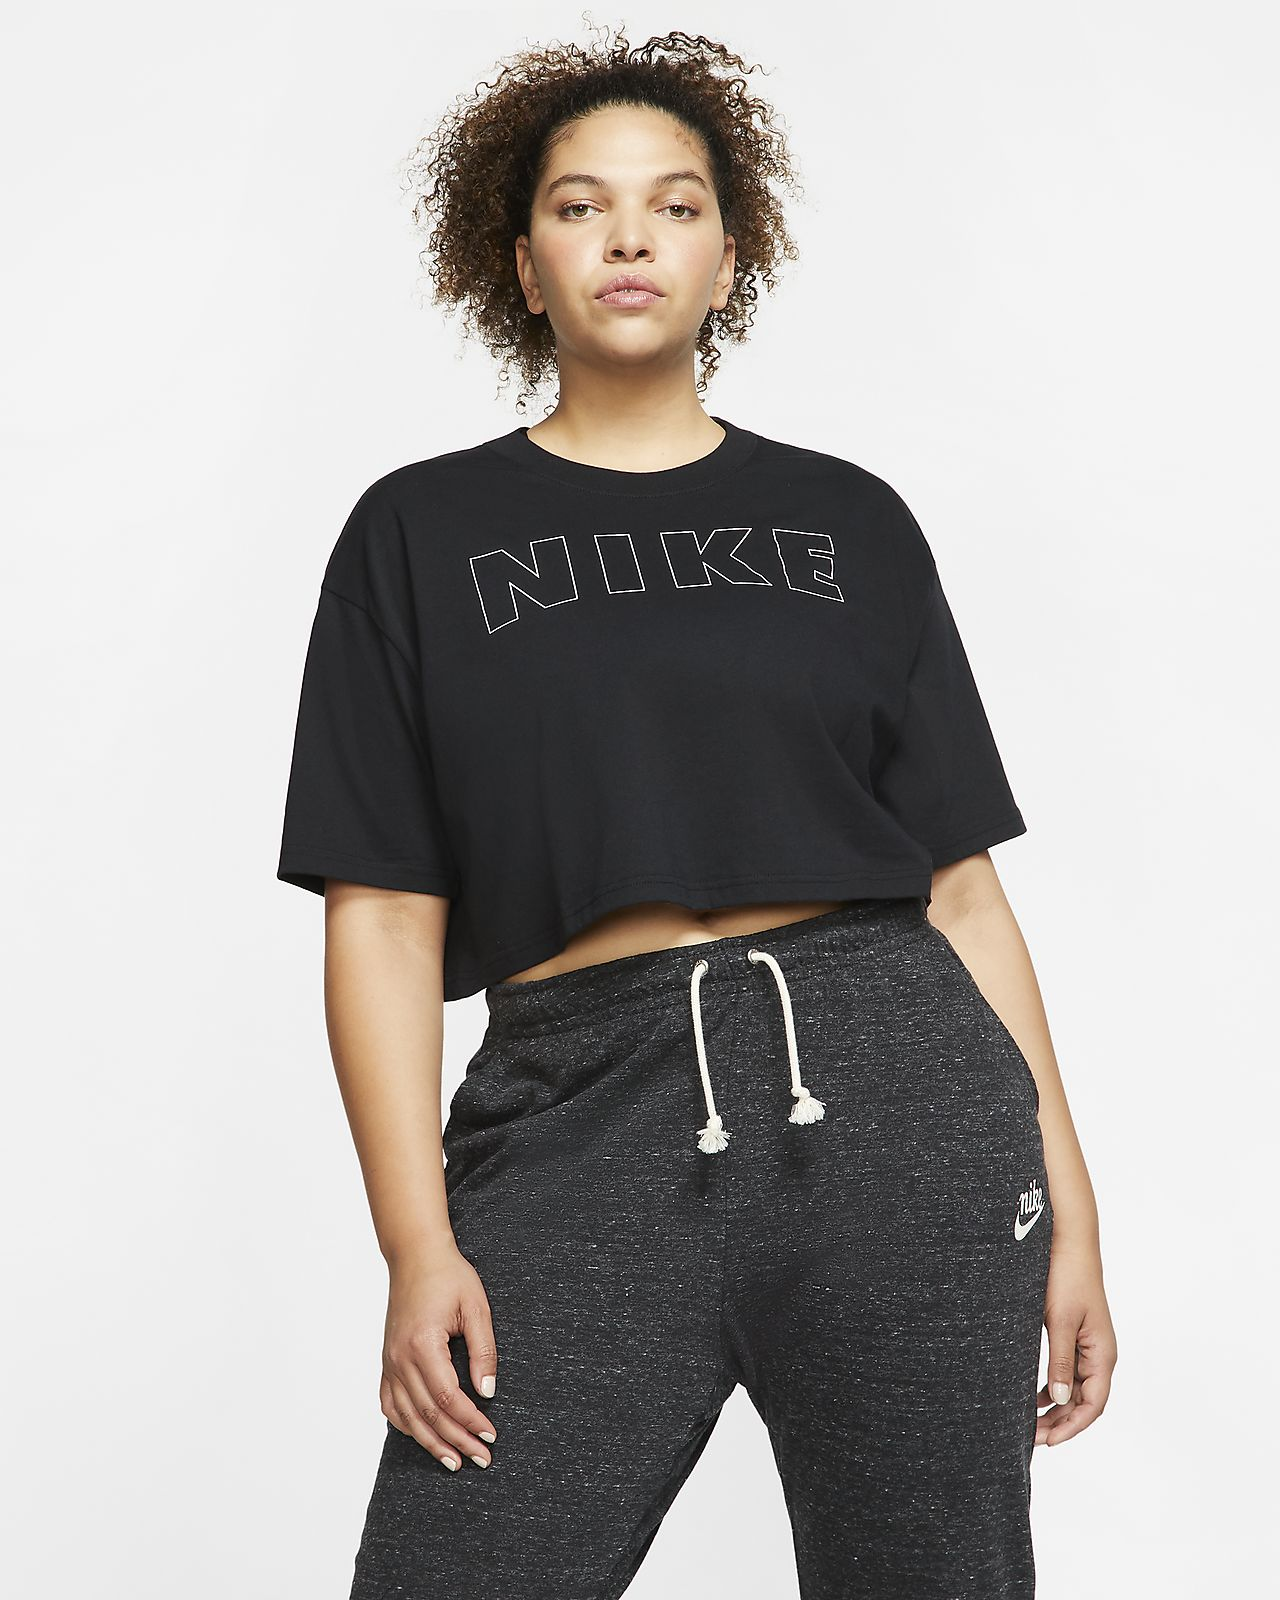 Kort Nike Air T shirt til kvinder (Plus Size). Nike DK